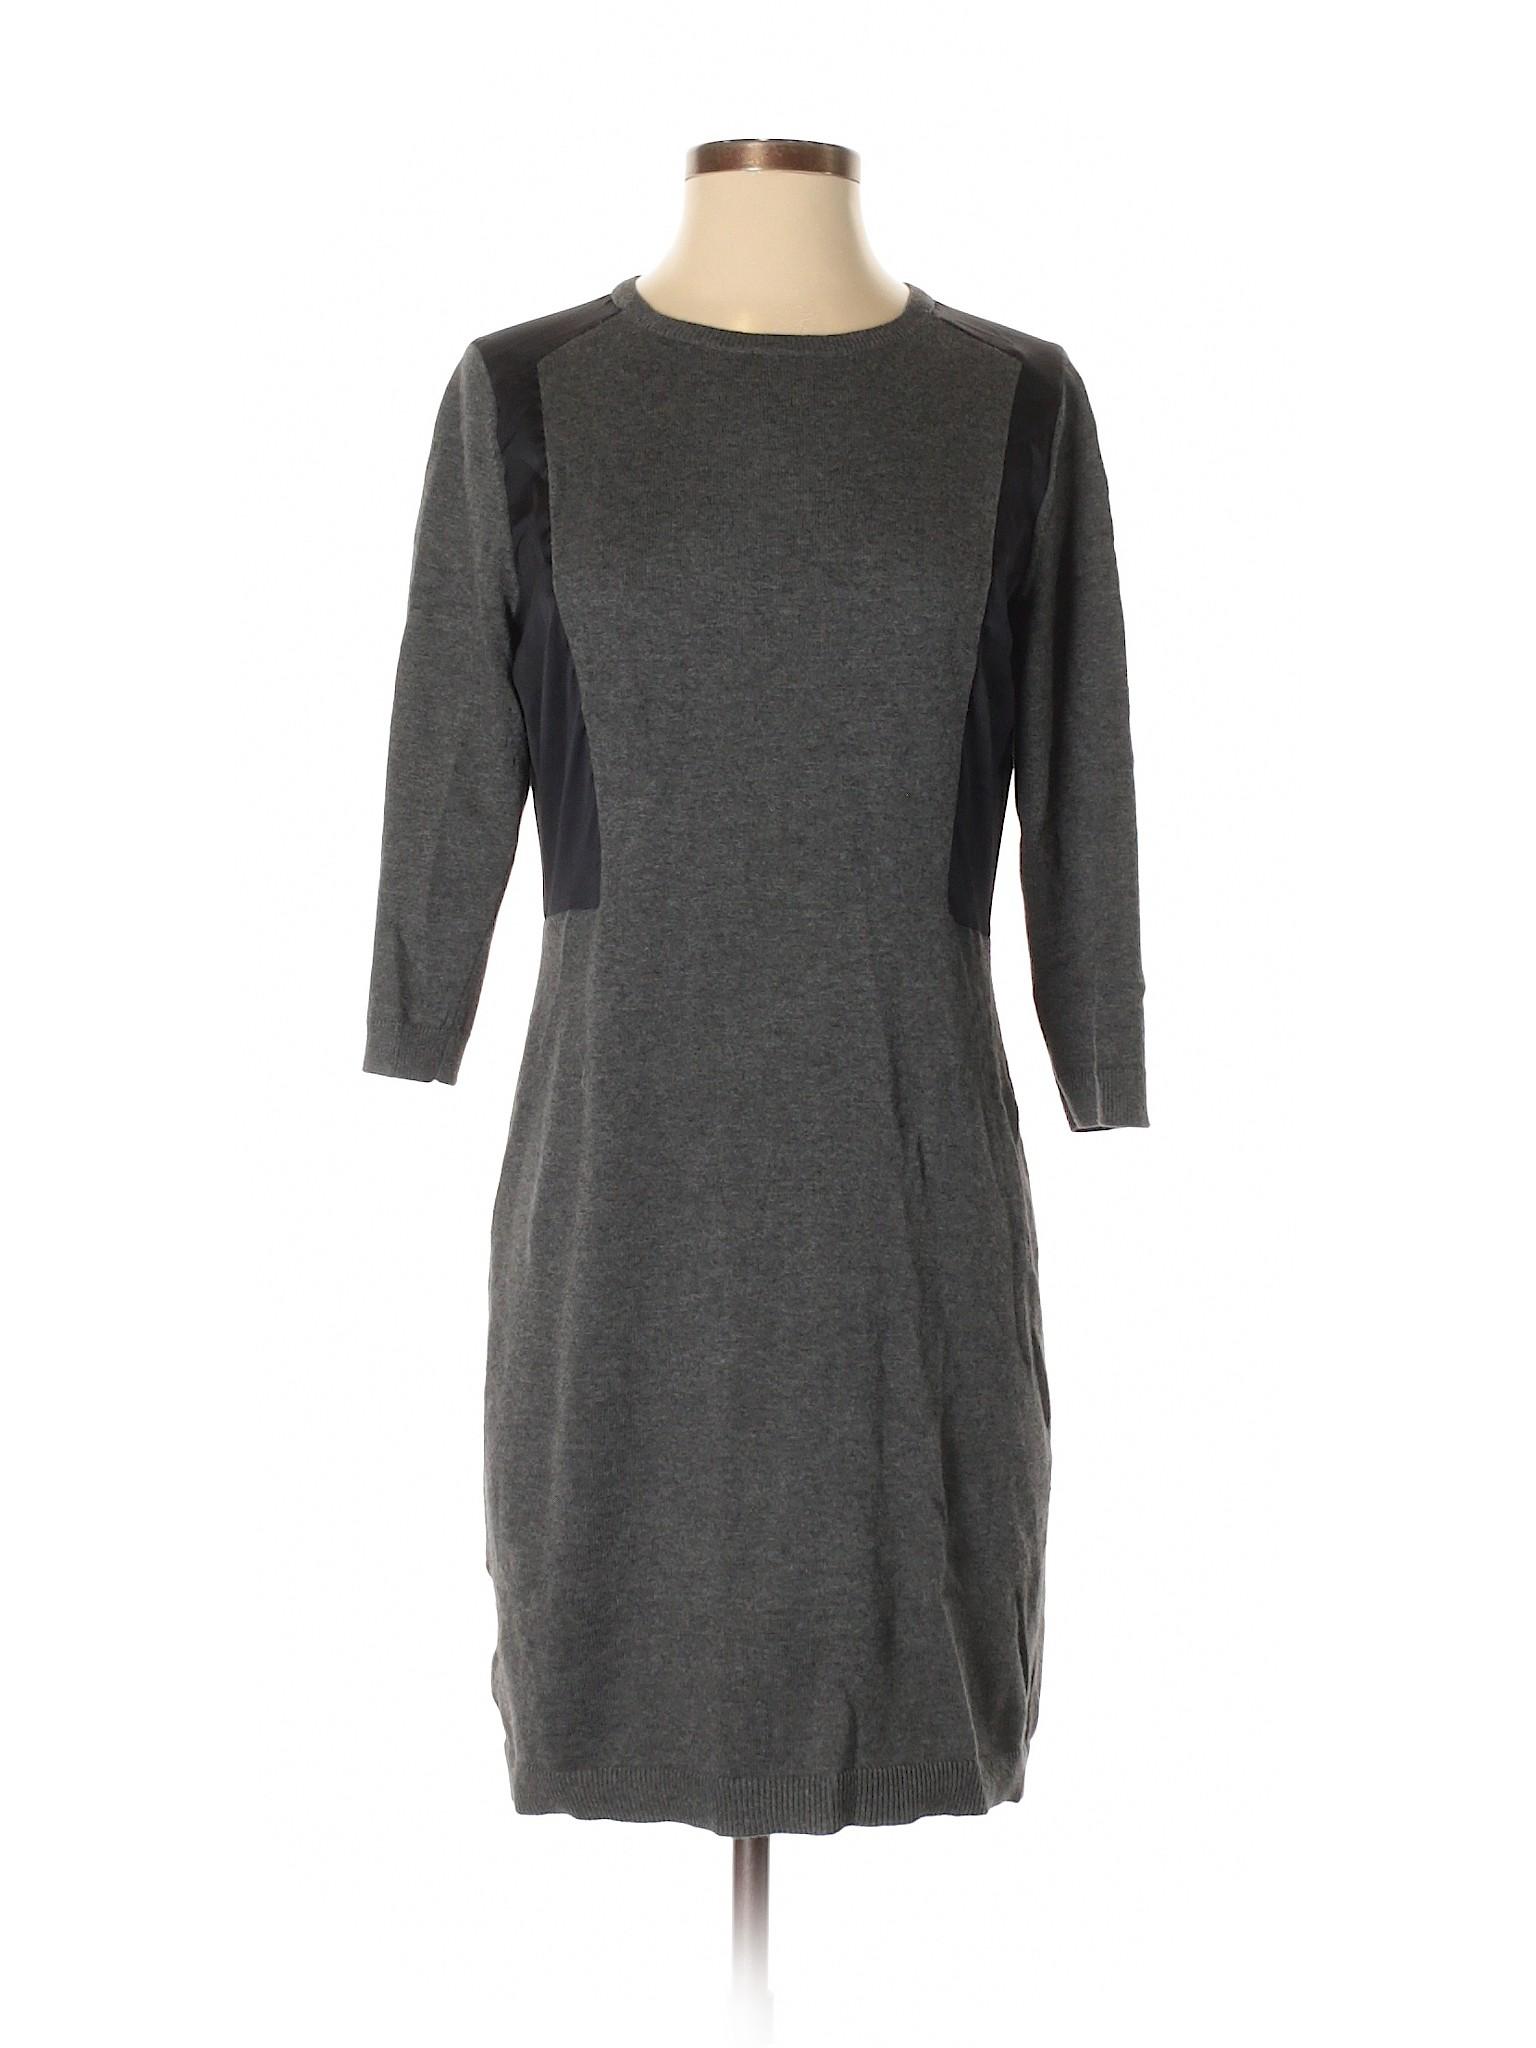 winter Taylor Casual Boutique Dress Ann wXqpZxB